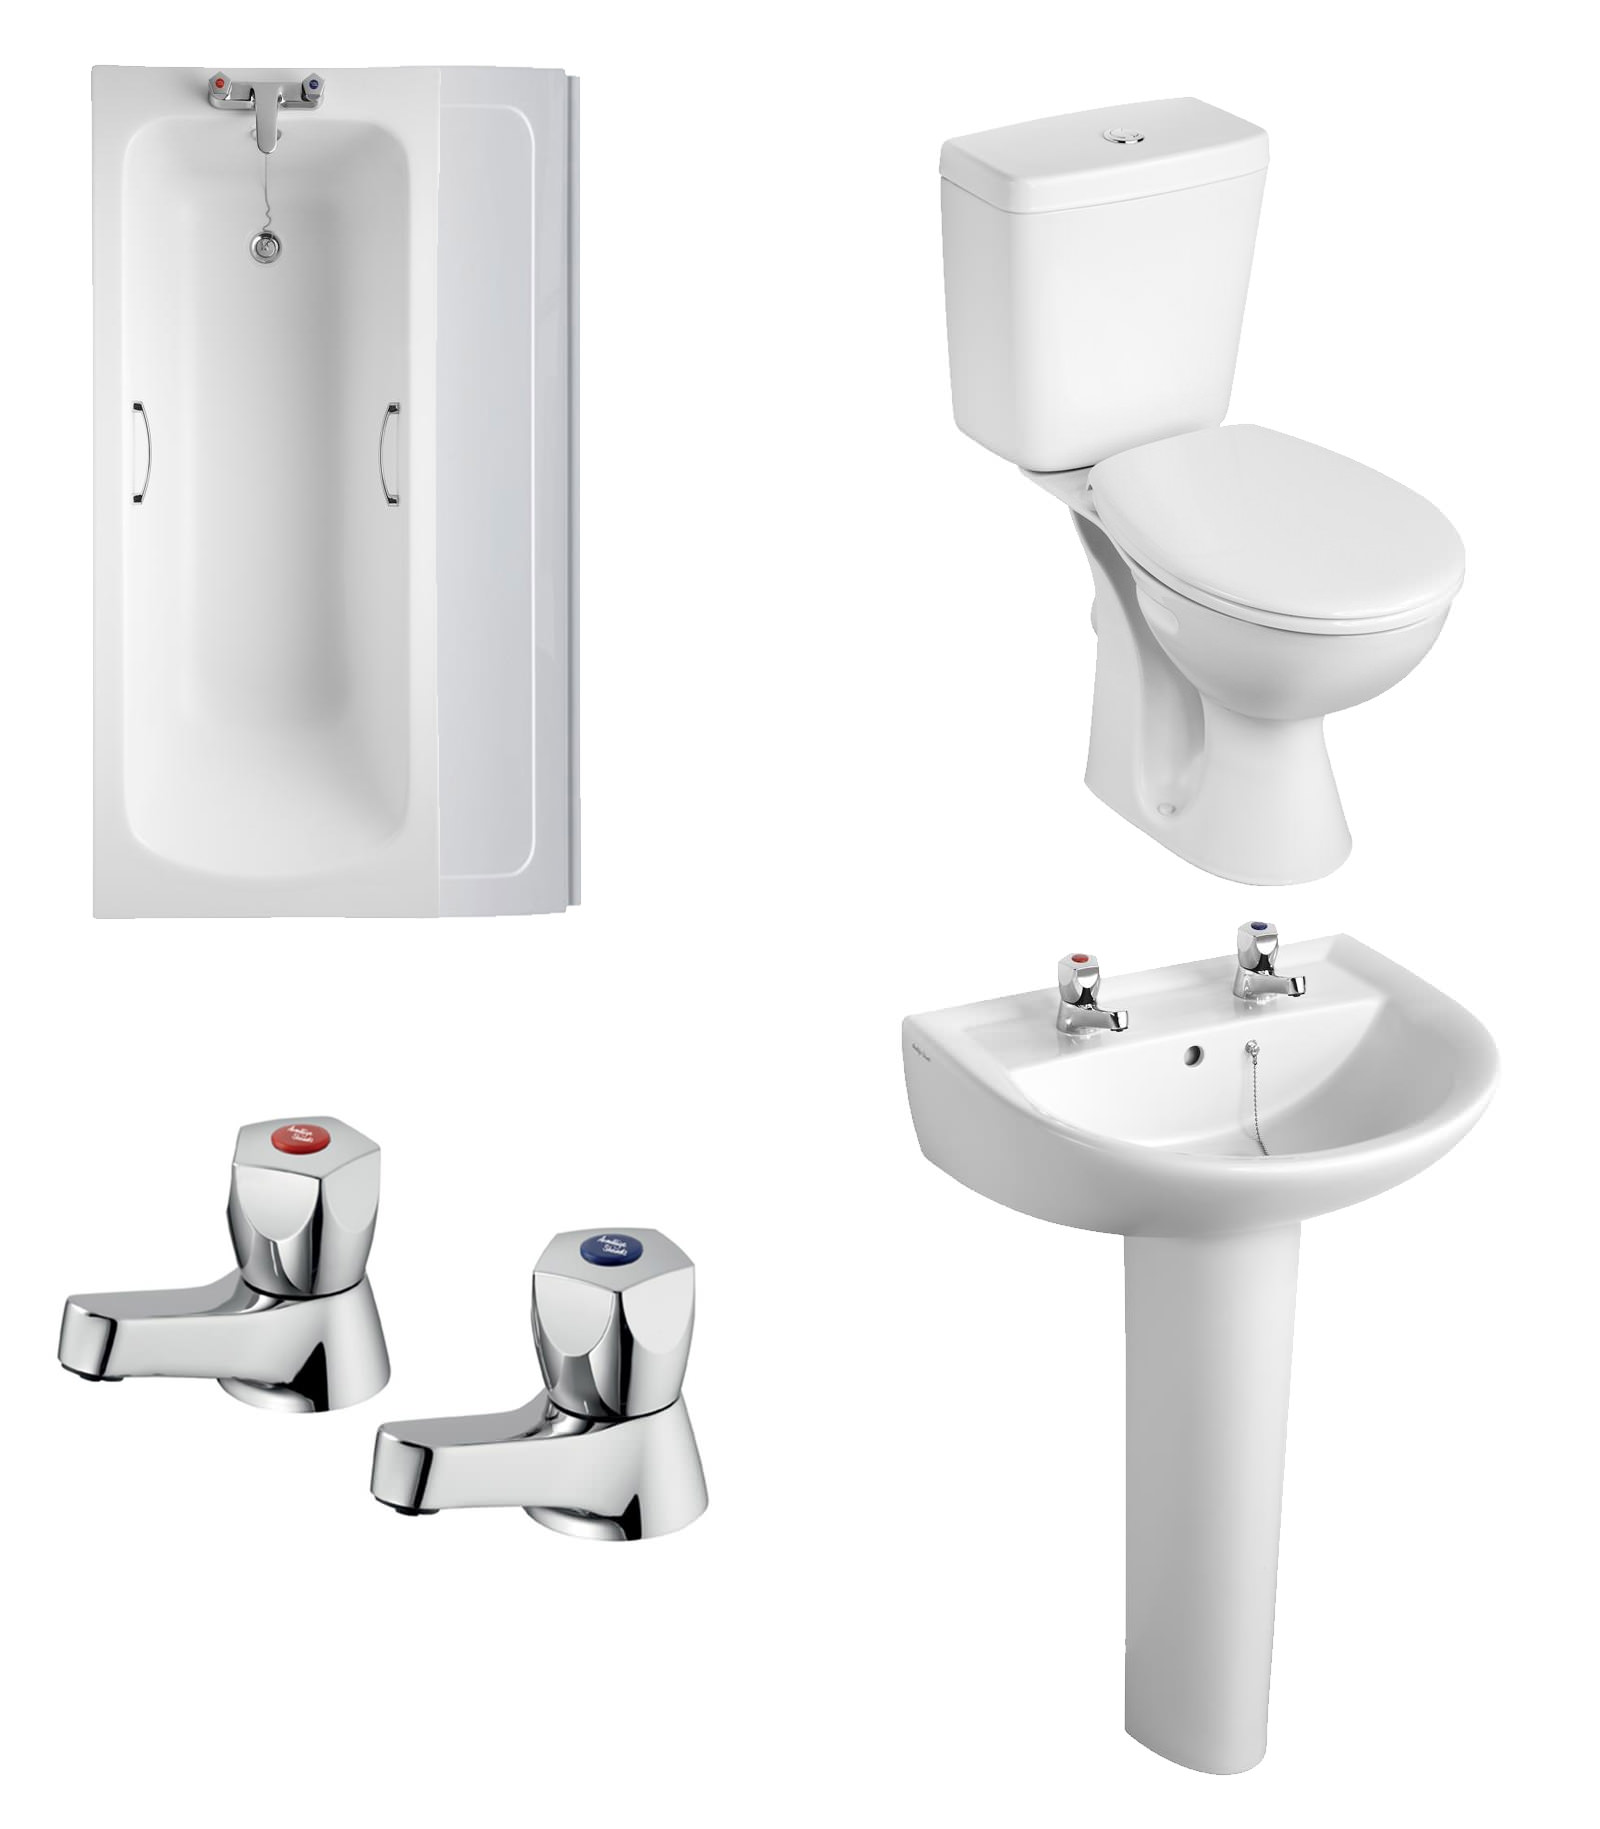 Armitage shanks bathroom sinks - Armitage Shanks Sandringham 21 Bathroom To Go Pack With 2th Basin